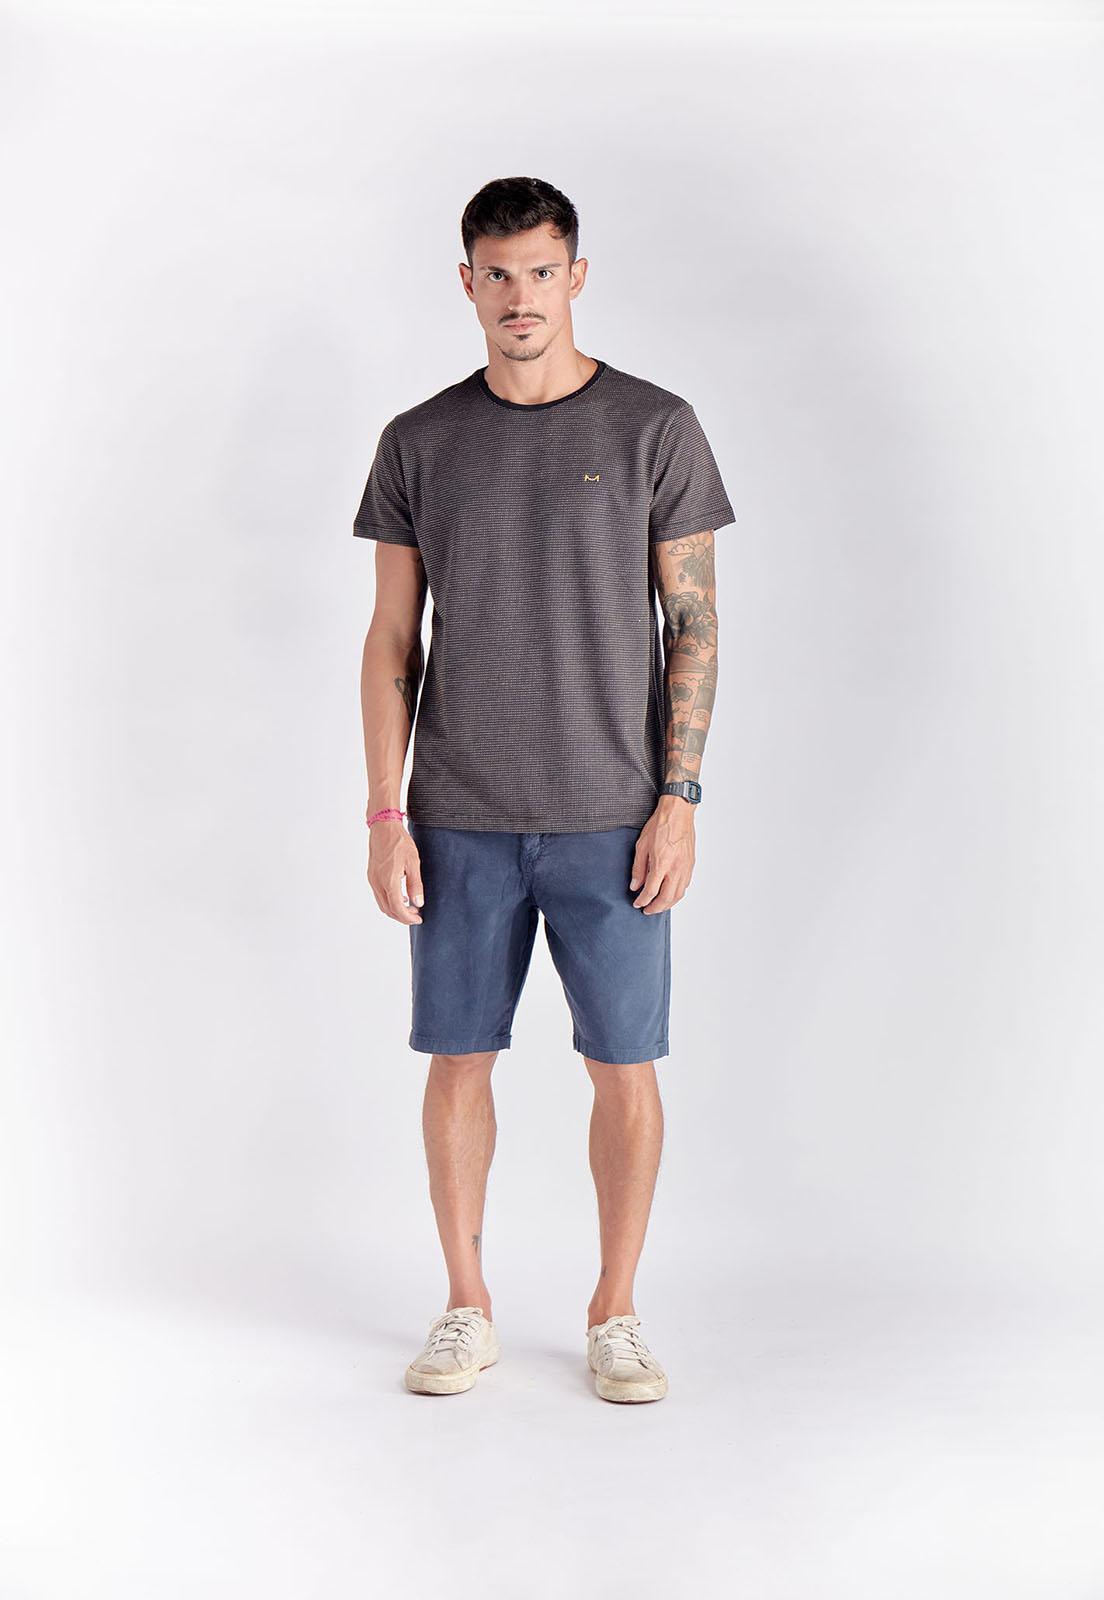 T-shirt Fabric Melty